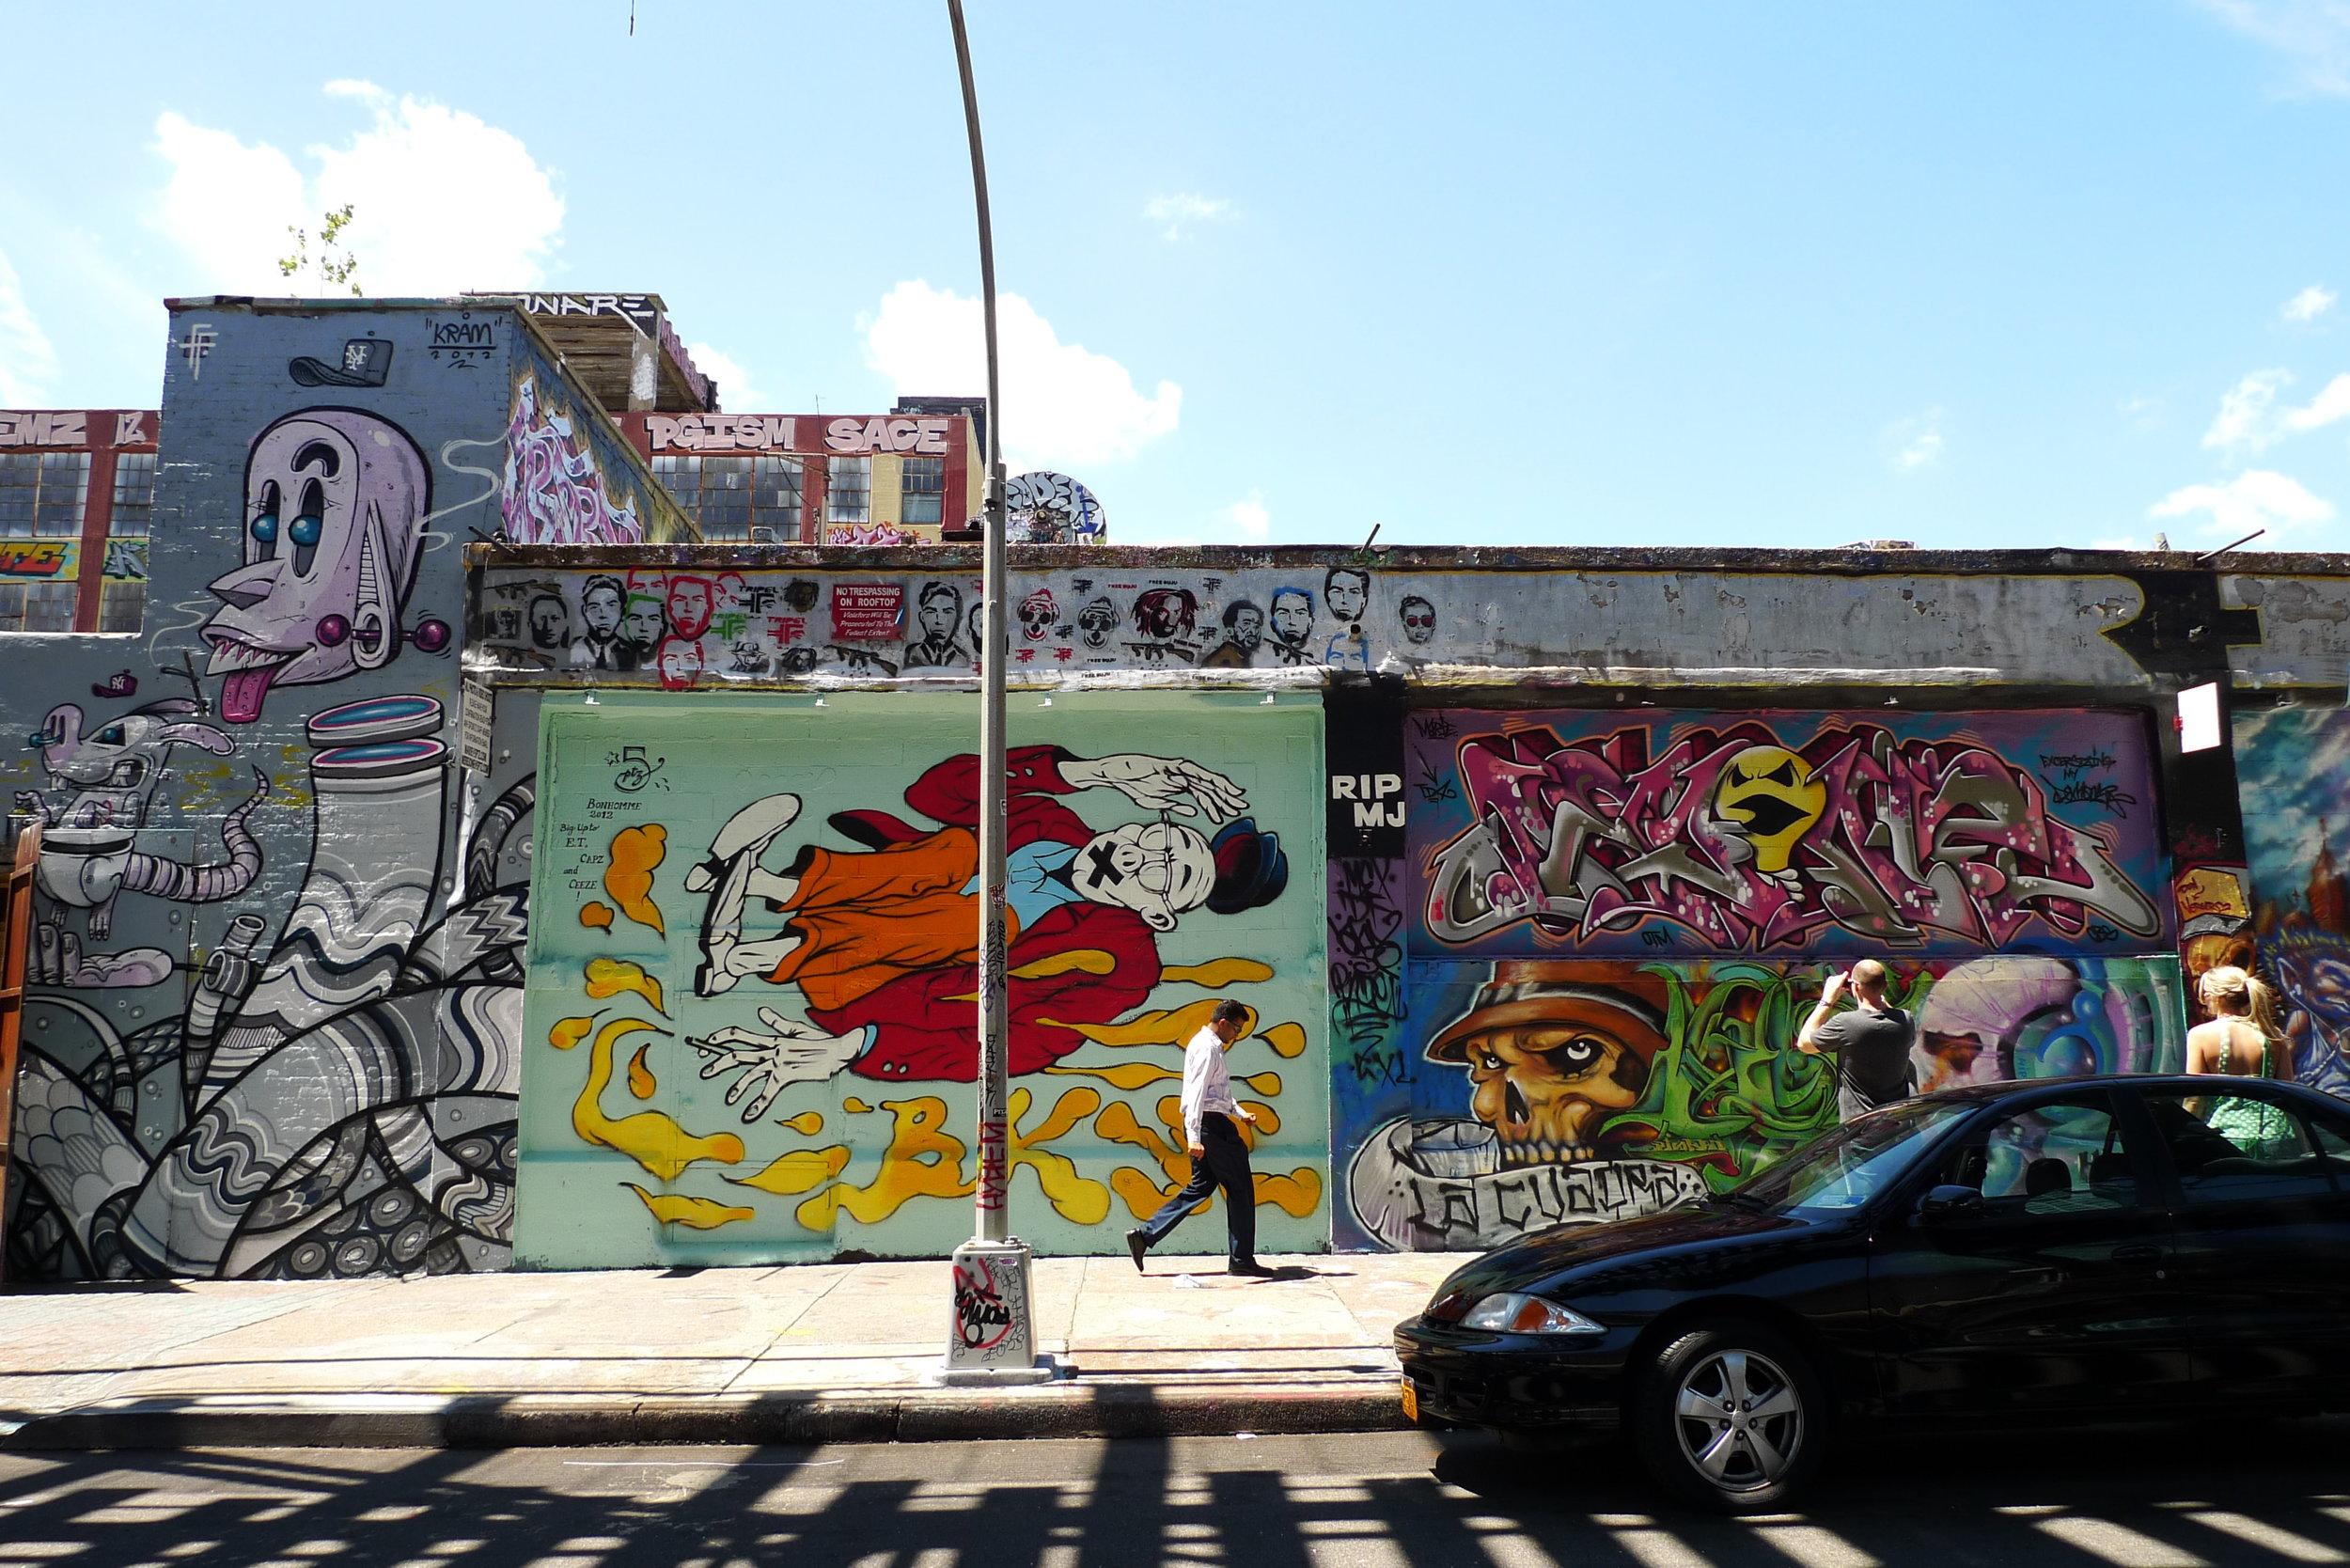 New York, 2012